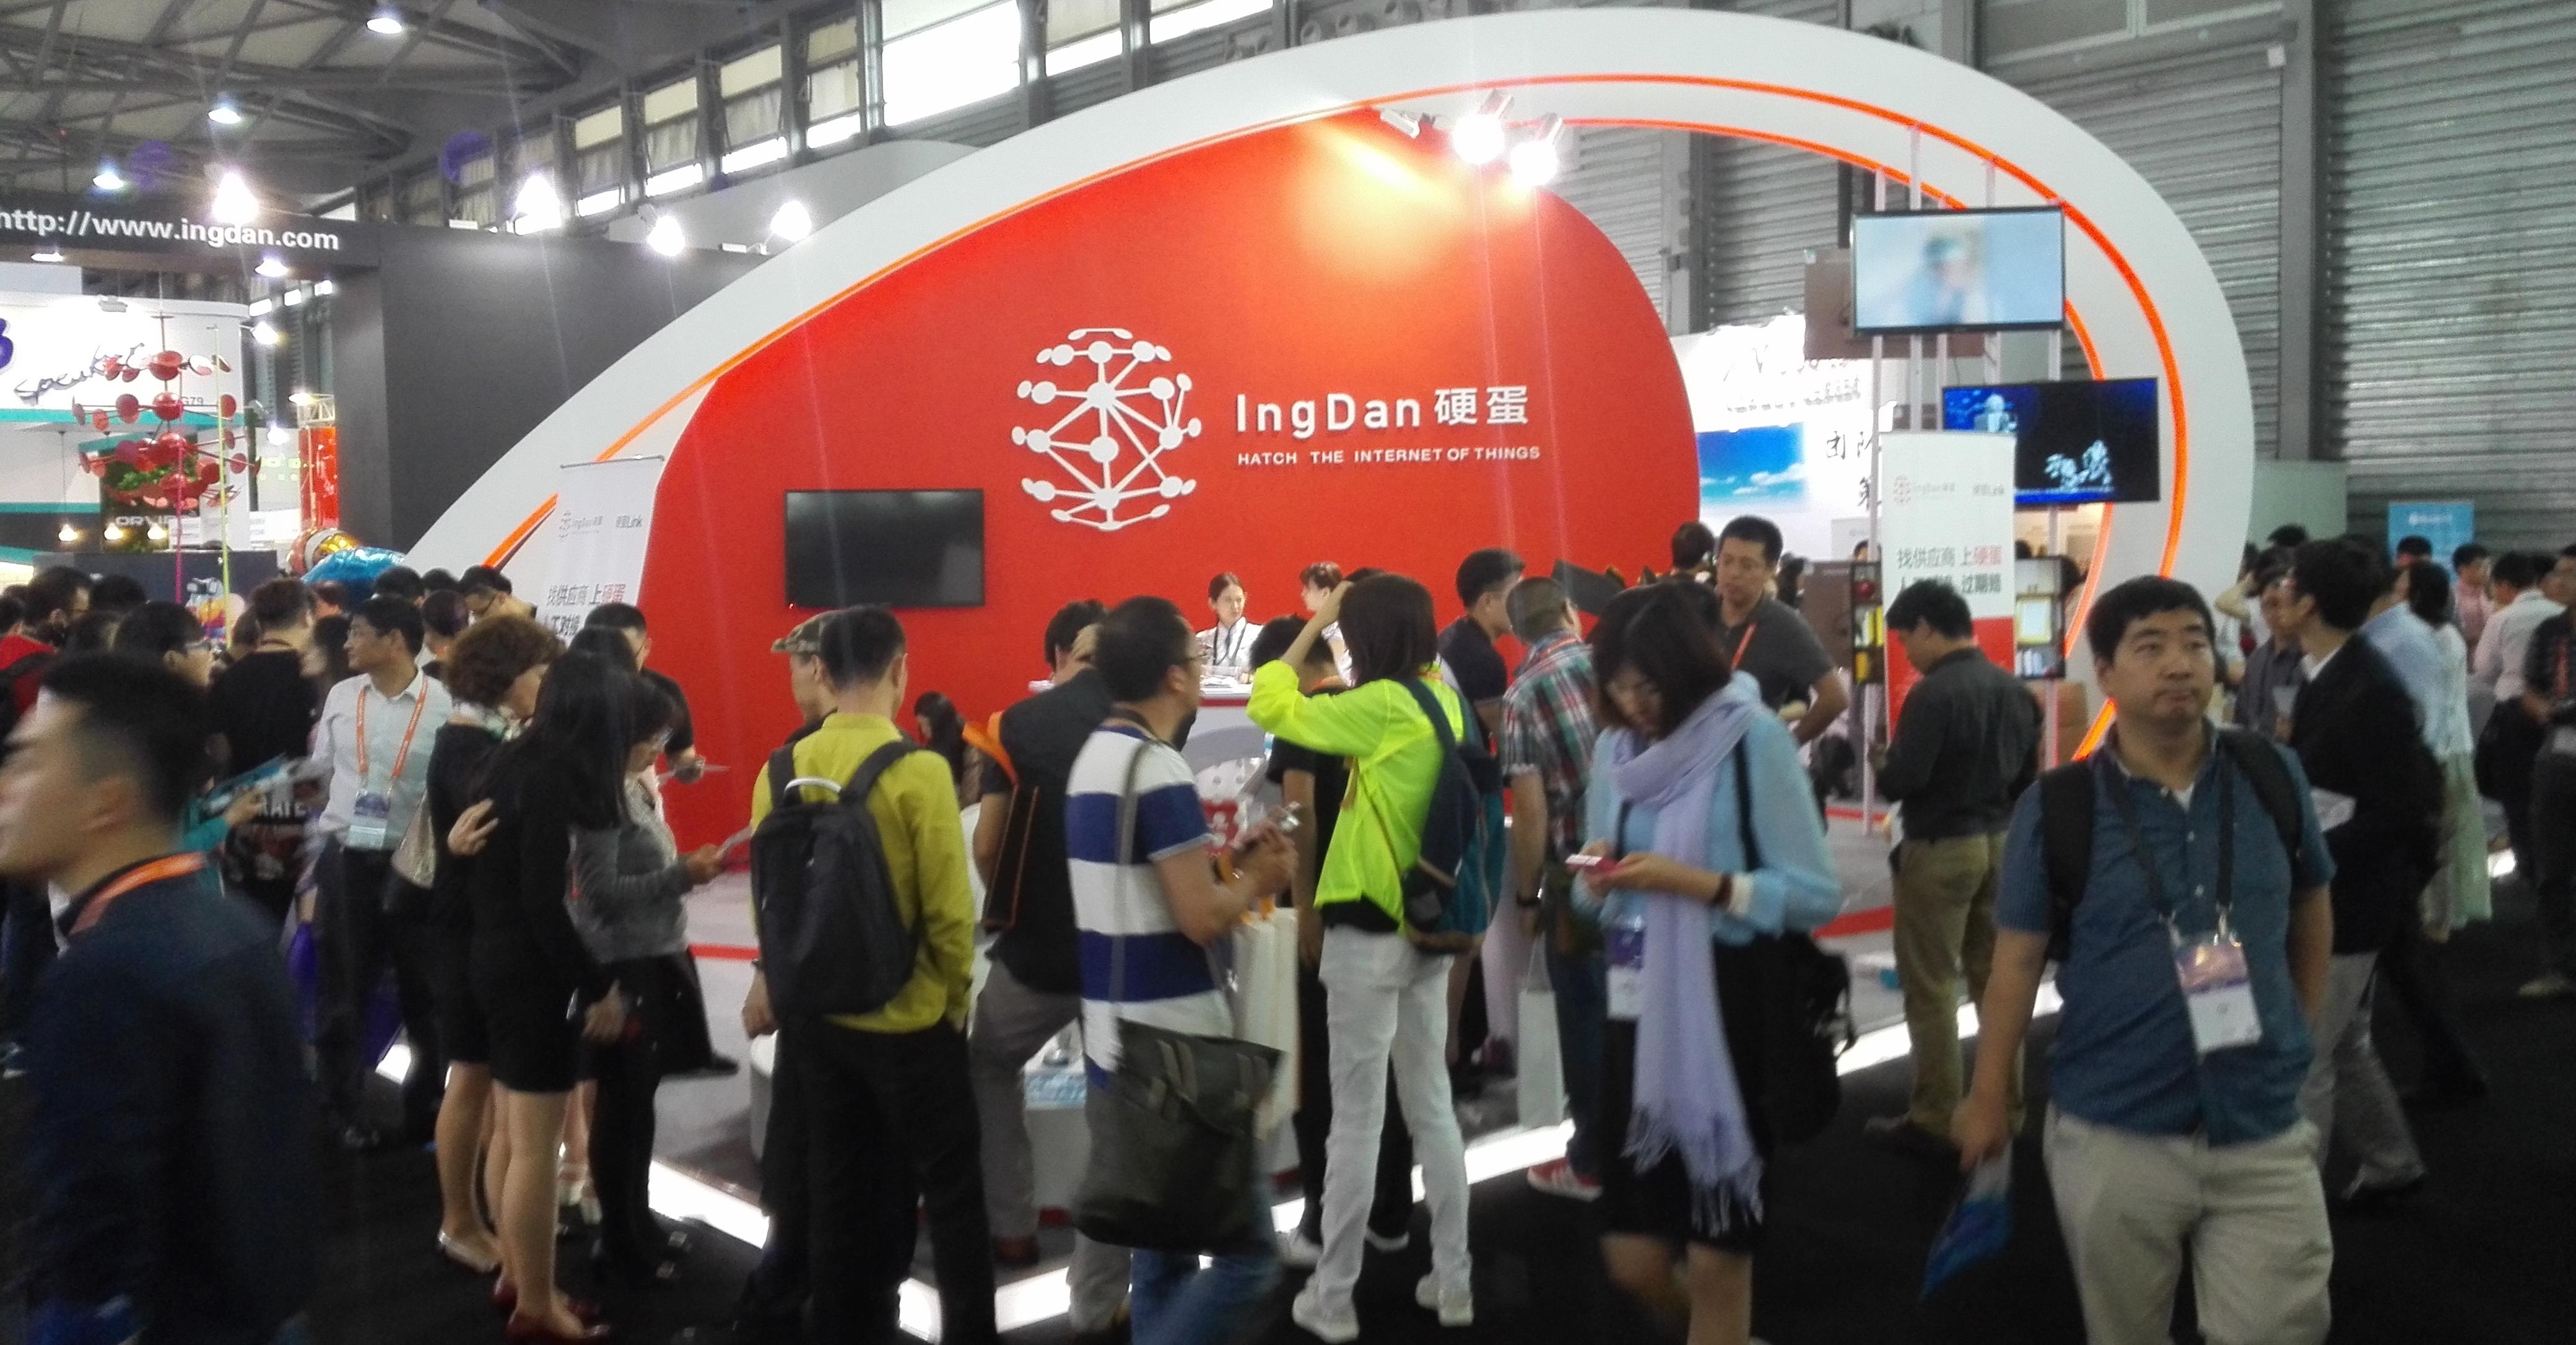 IngDan China's Startup Incubators